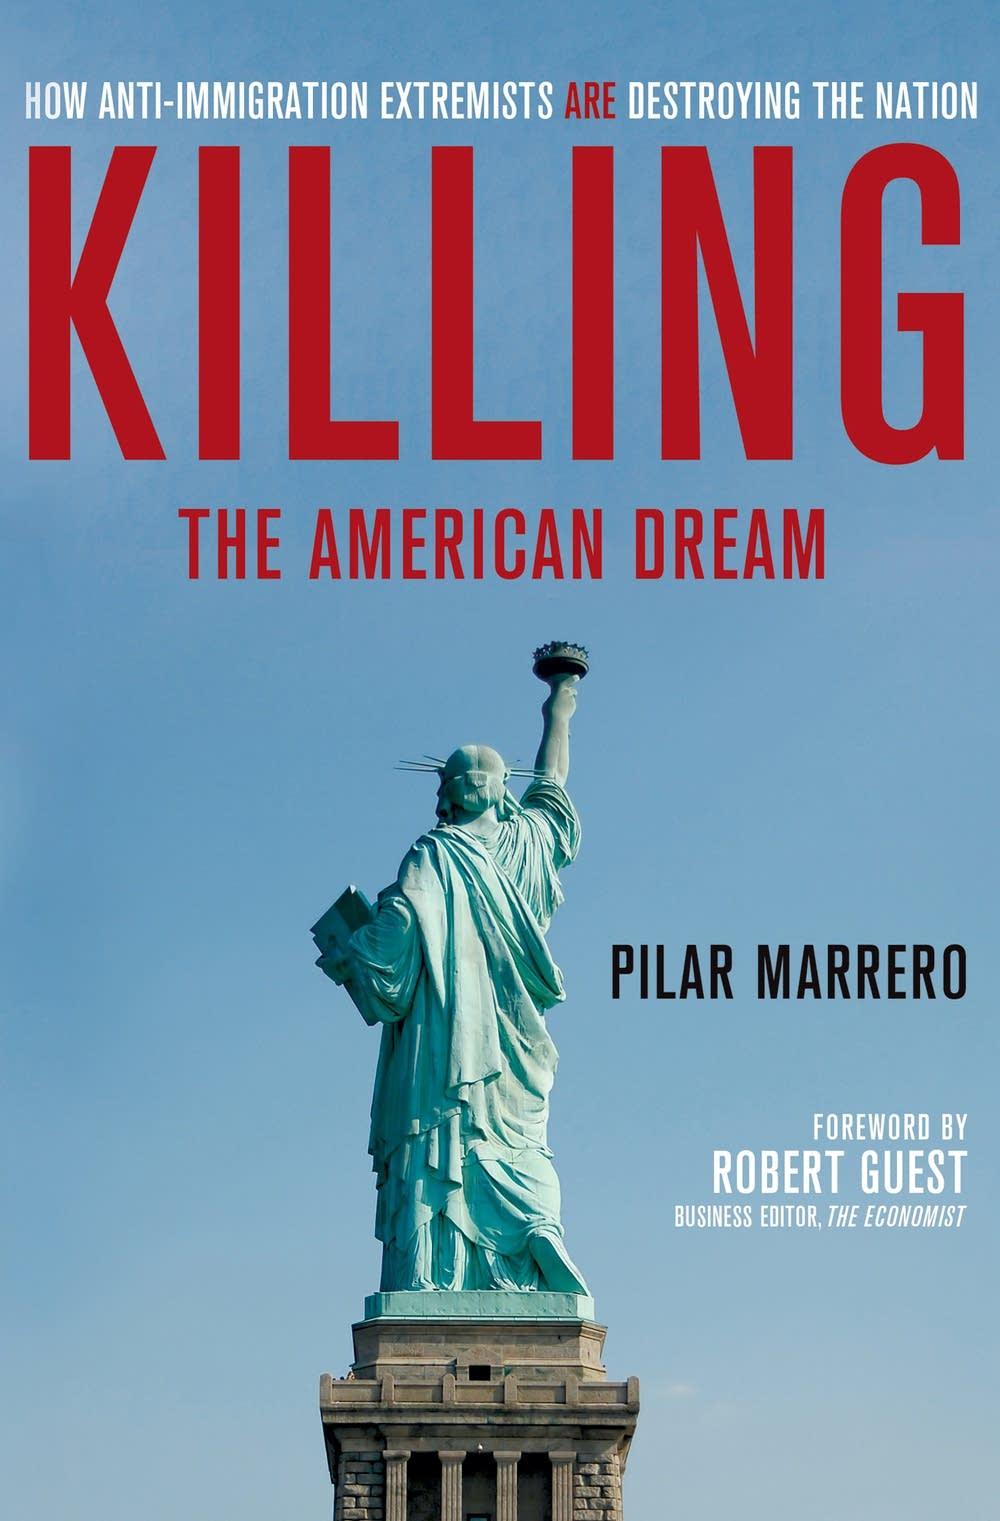 'Killing the American Dream' by Pilar Marrero